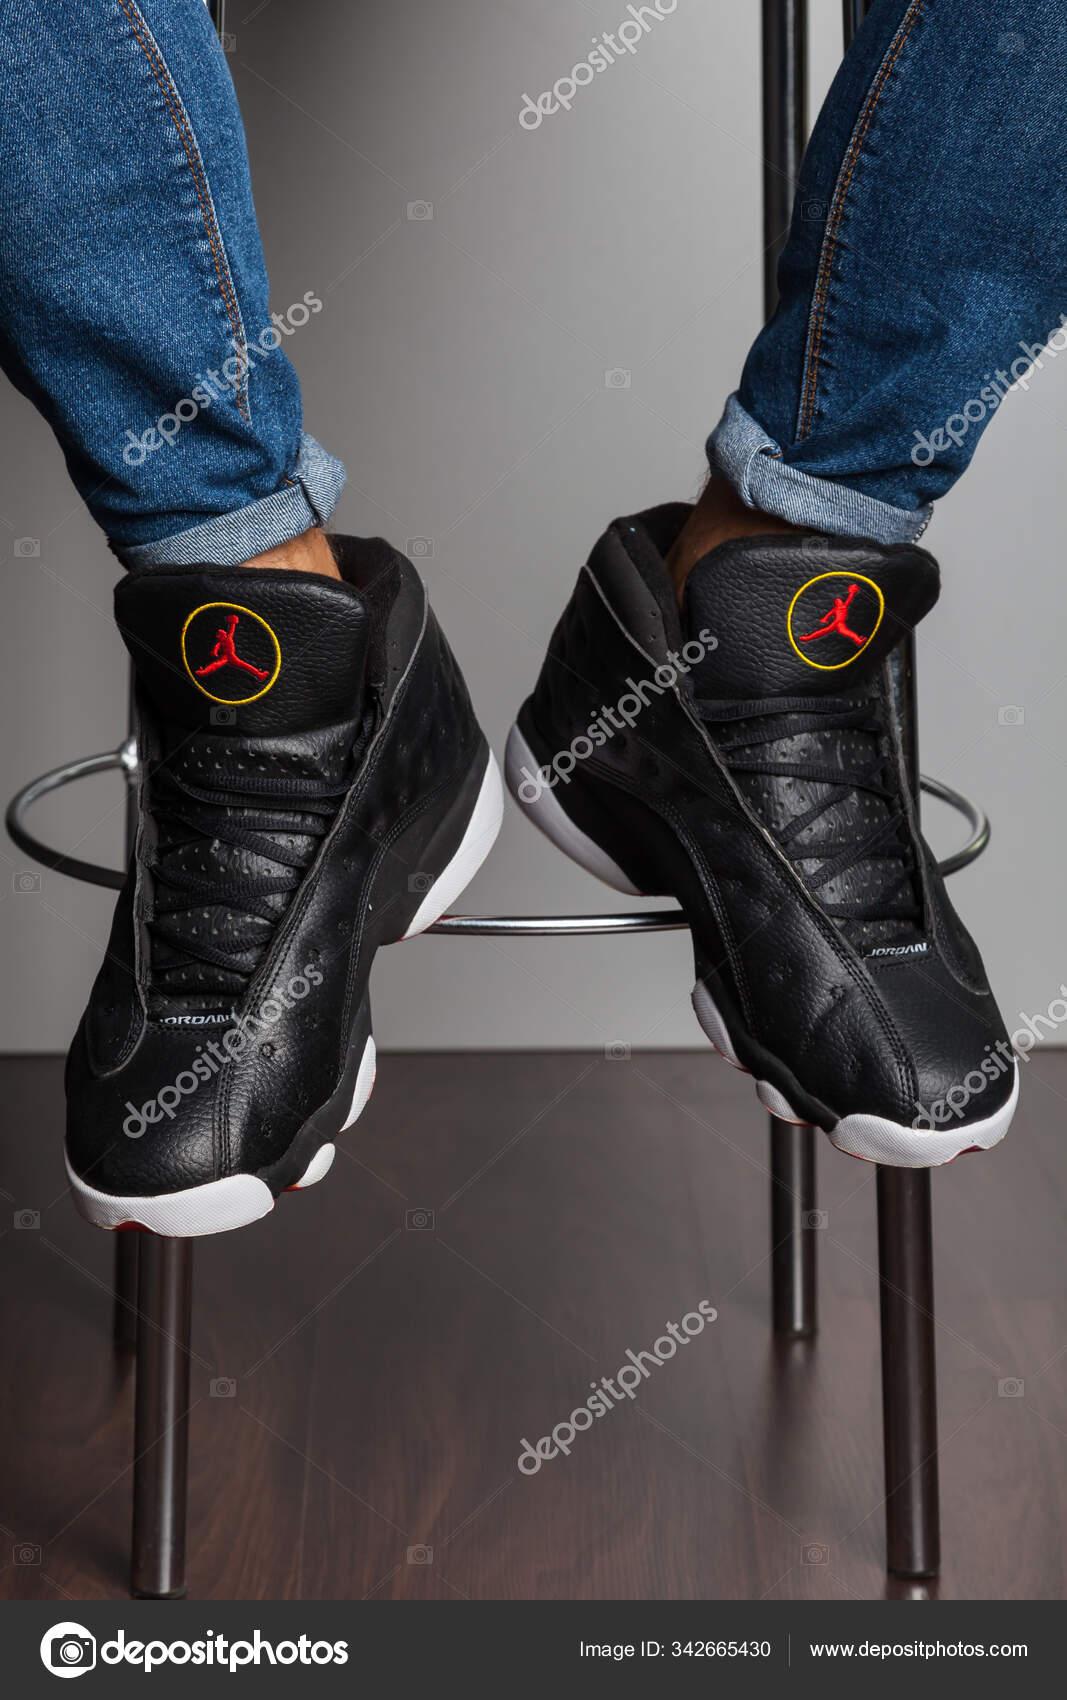 New Beautiful Colorful Nice Jordan Air Max Running Shoes Sneakers Stock Editorial Photo C Sozon 342665430